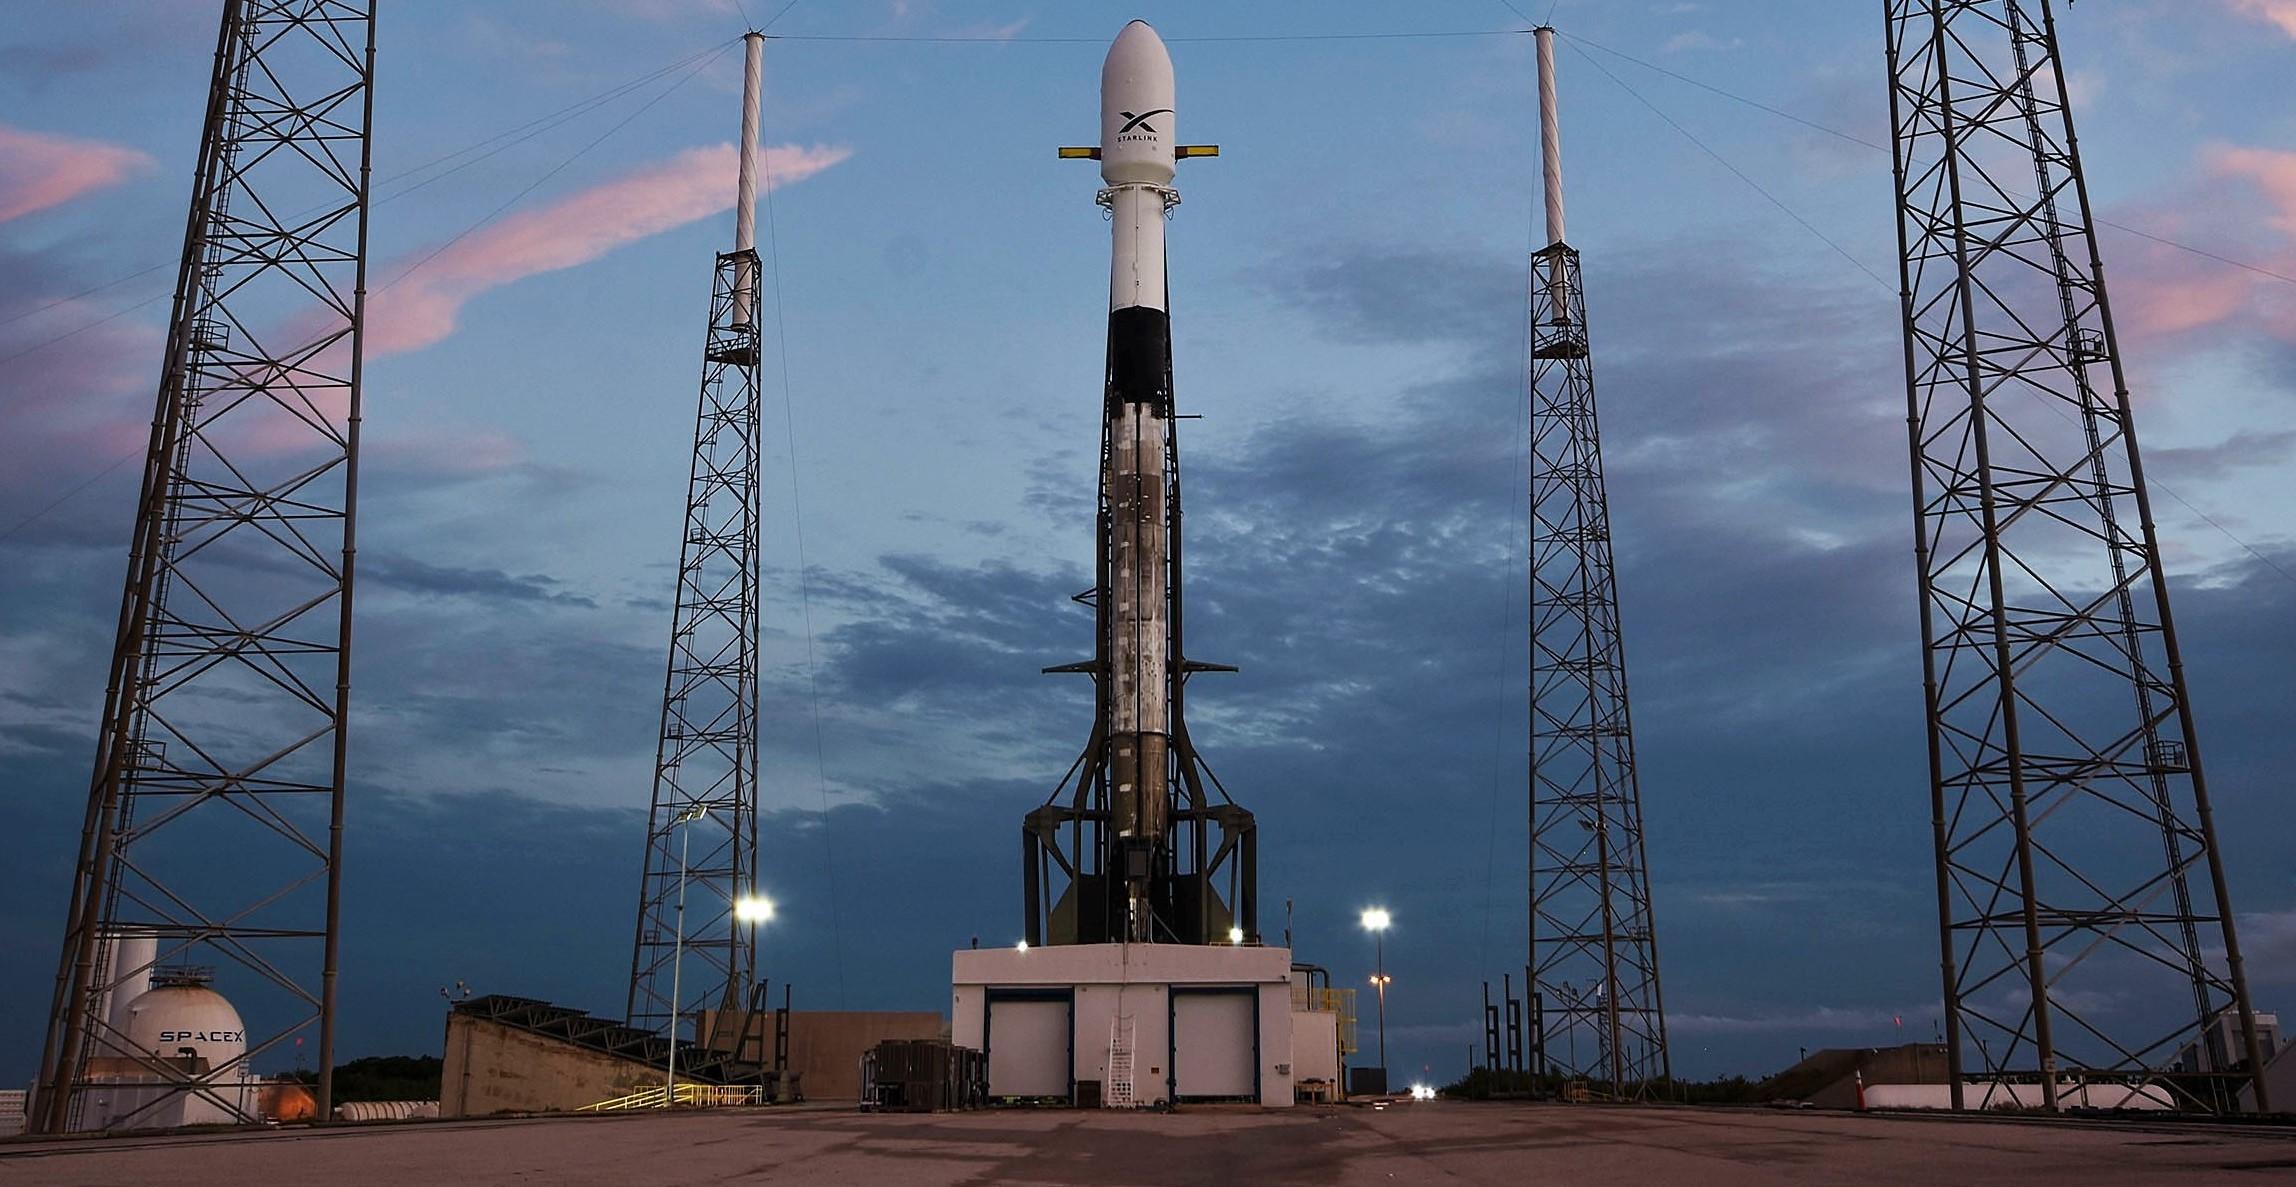 Falcon 9 B1049 Starlink v0.9 preflight LC40 051419 (SpaceX) 1 crop